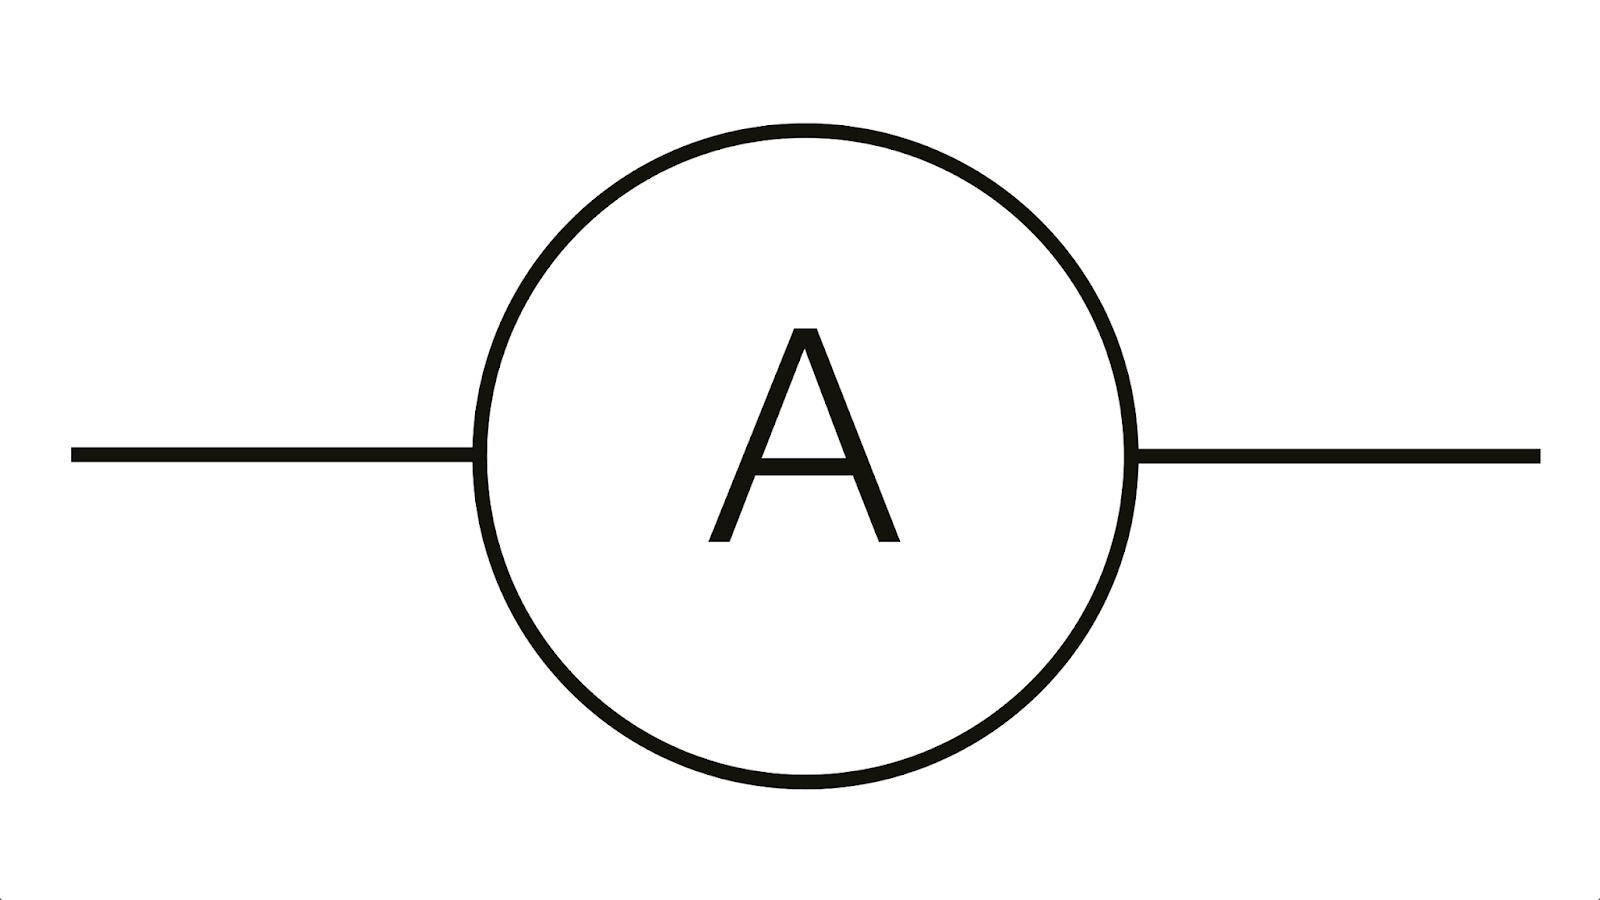 medium resolution of symbol of ammeter is